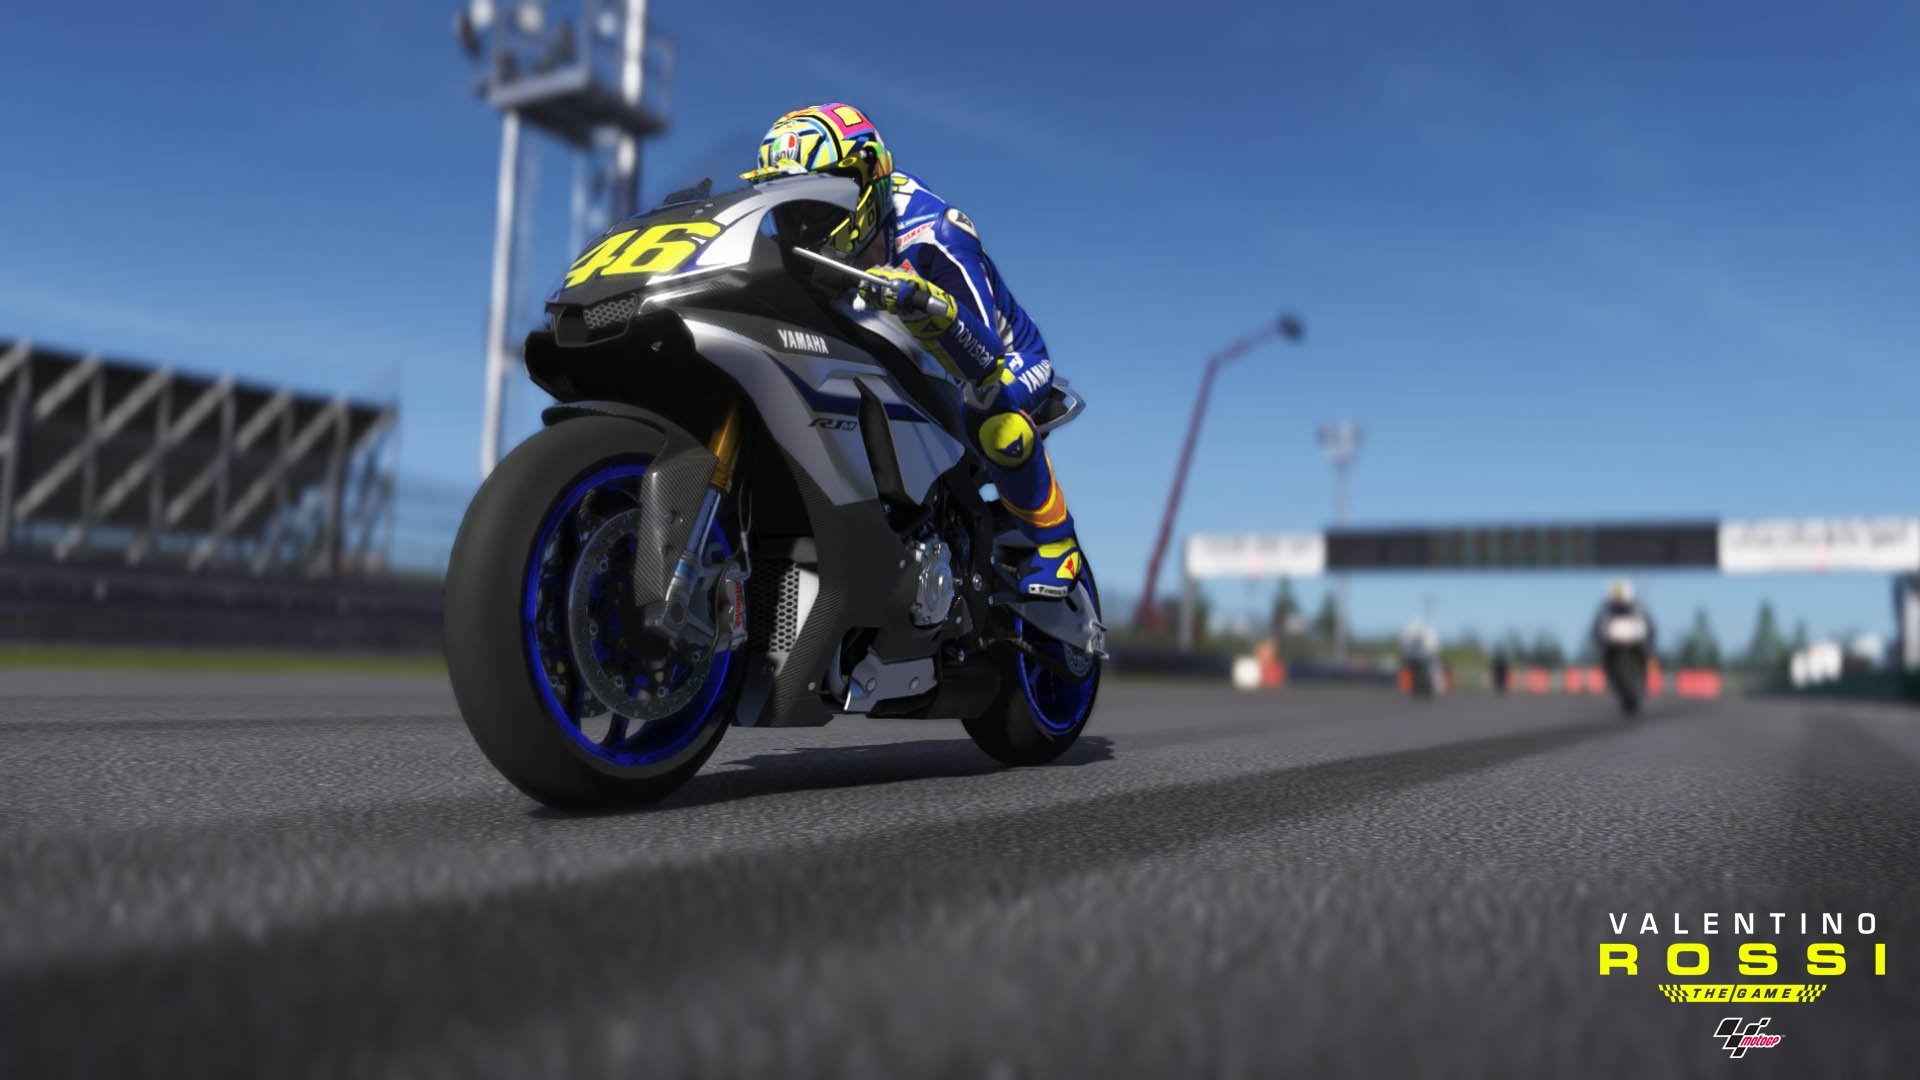 Valentino Rossi The Game 4